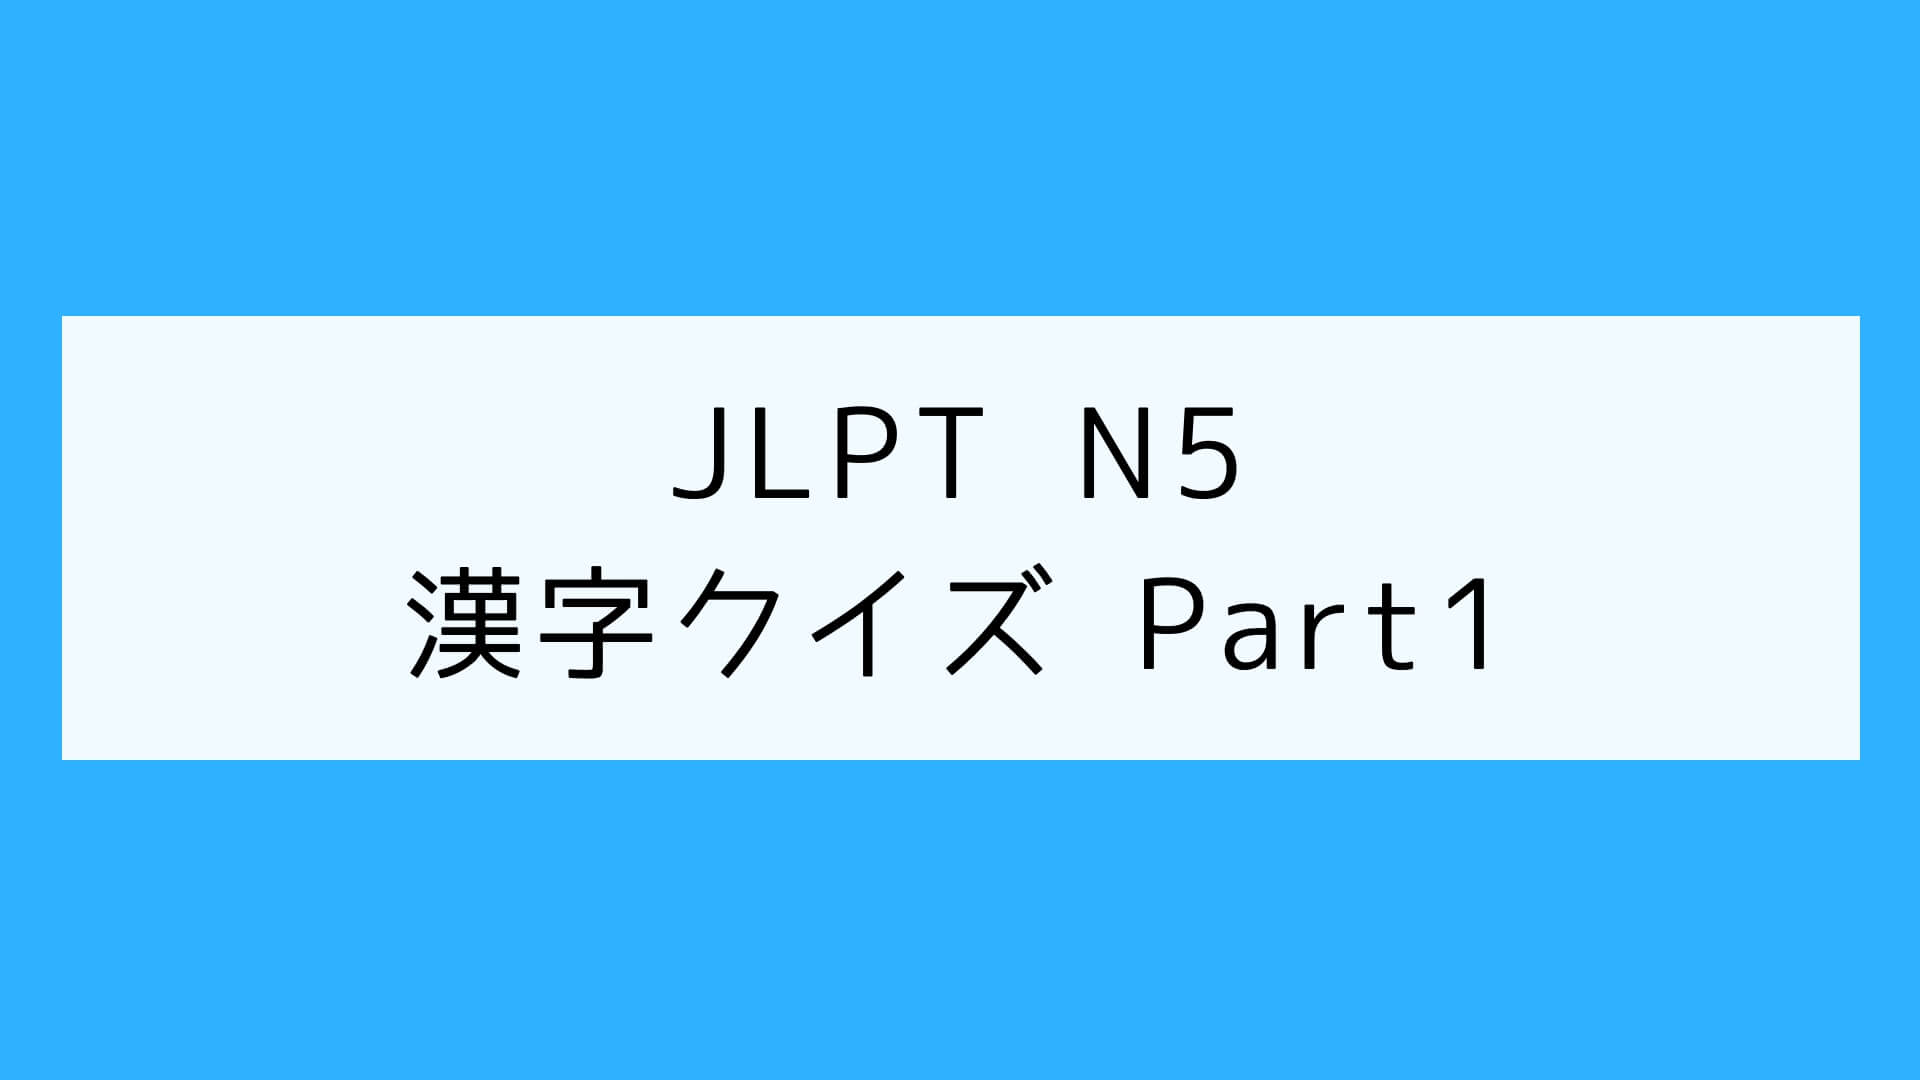 【JLPT N5】漢字クイズ Part1